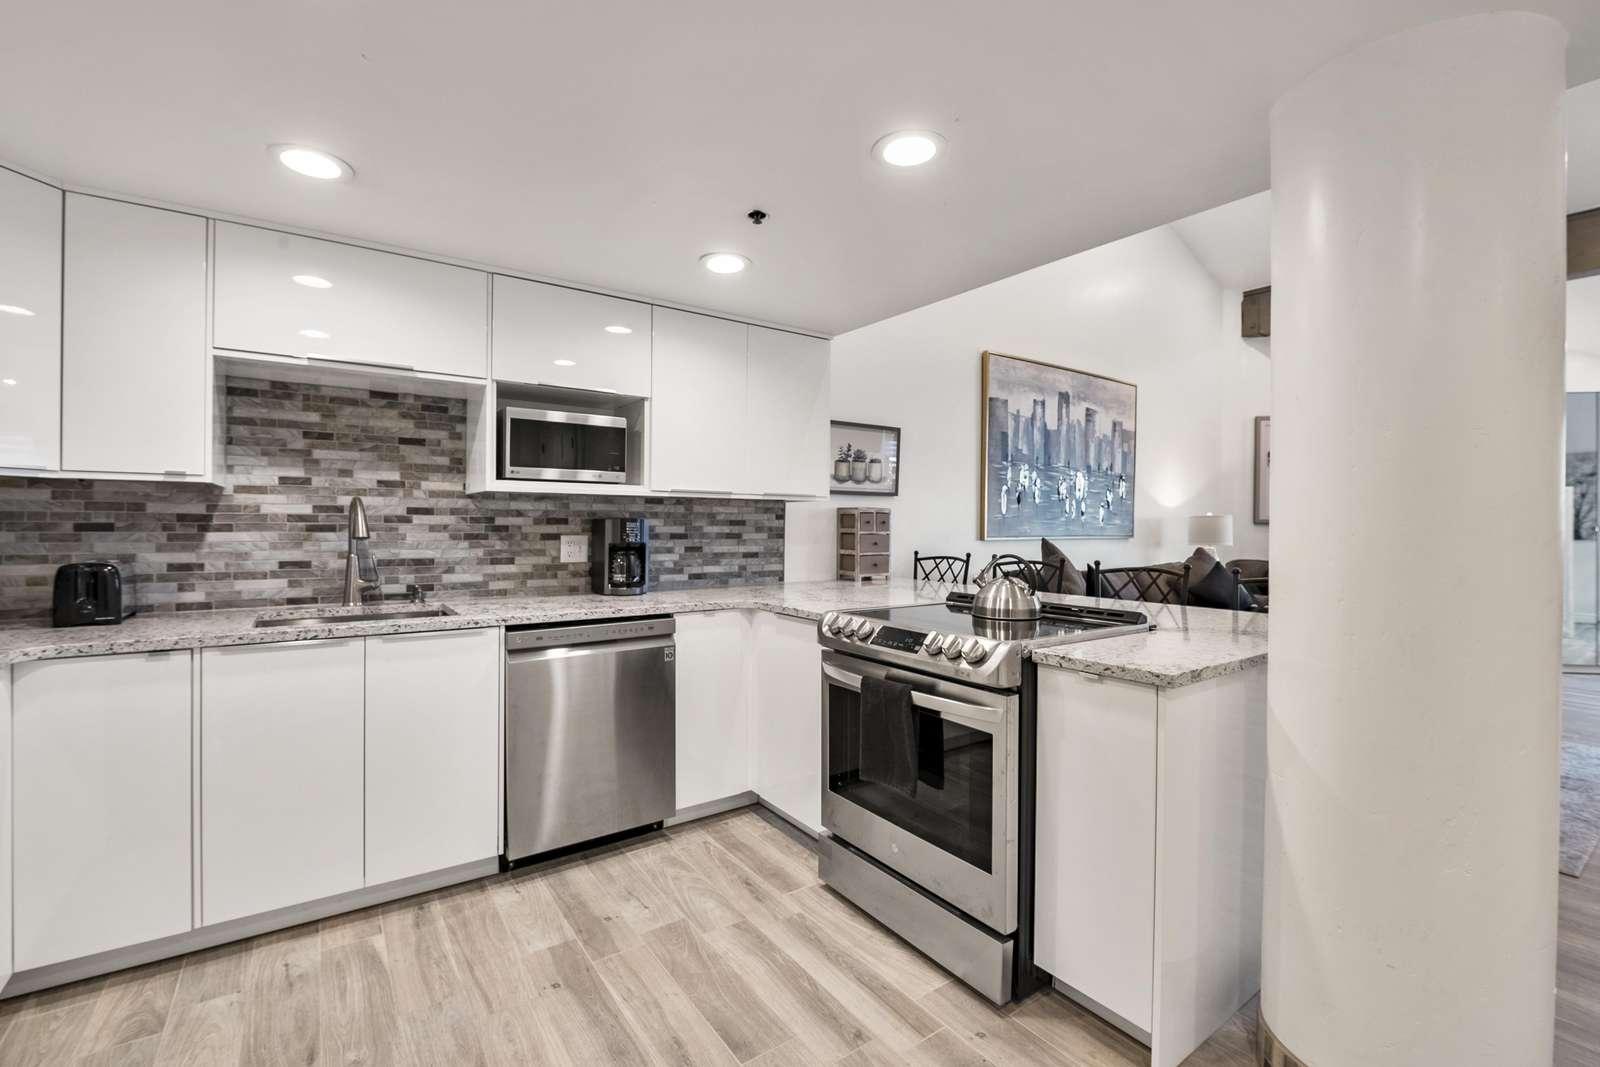 Brand new stylish kitchen